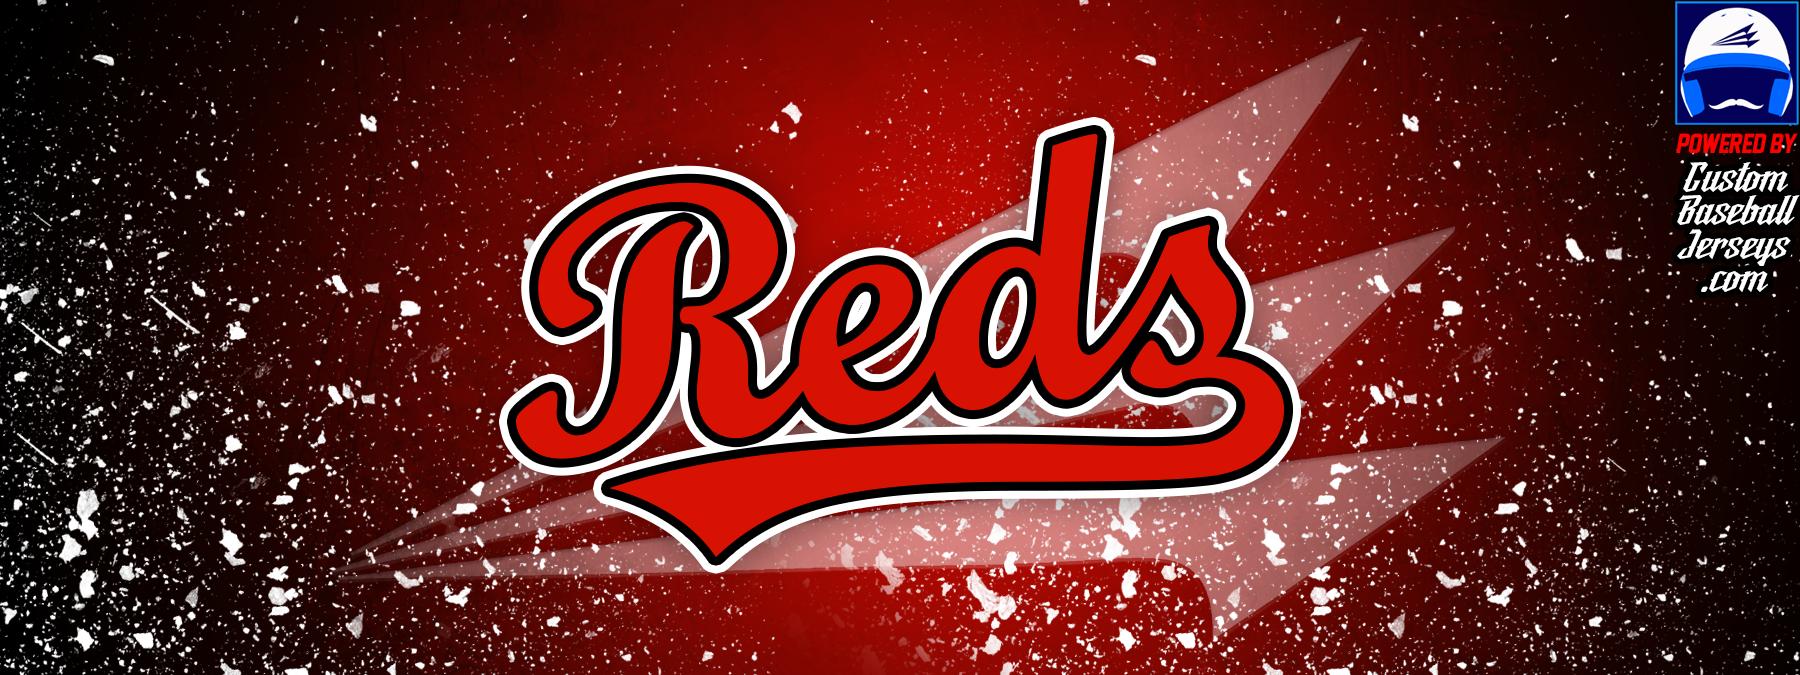 330b8cc80 Clinton Baseball Reds Custom Throwback Baseball Jerseys - Custom Baseball  Jerseys.com - The World s  1 Choice for Custom Baseball Uniforms